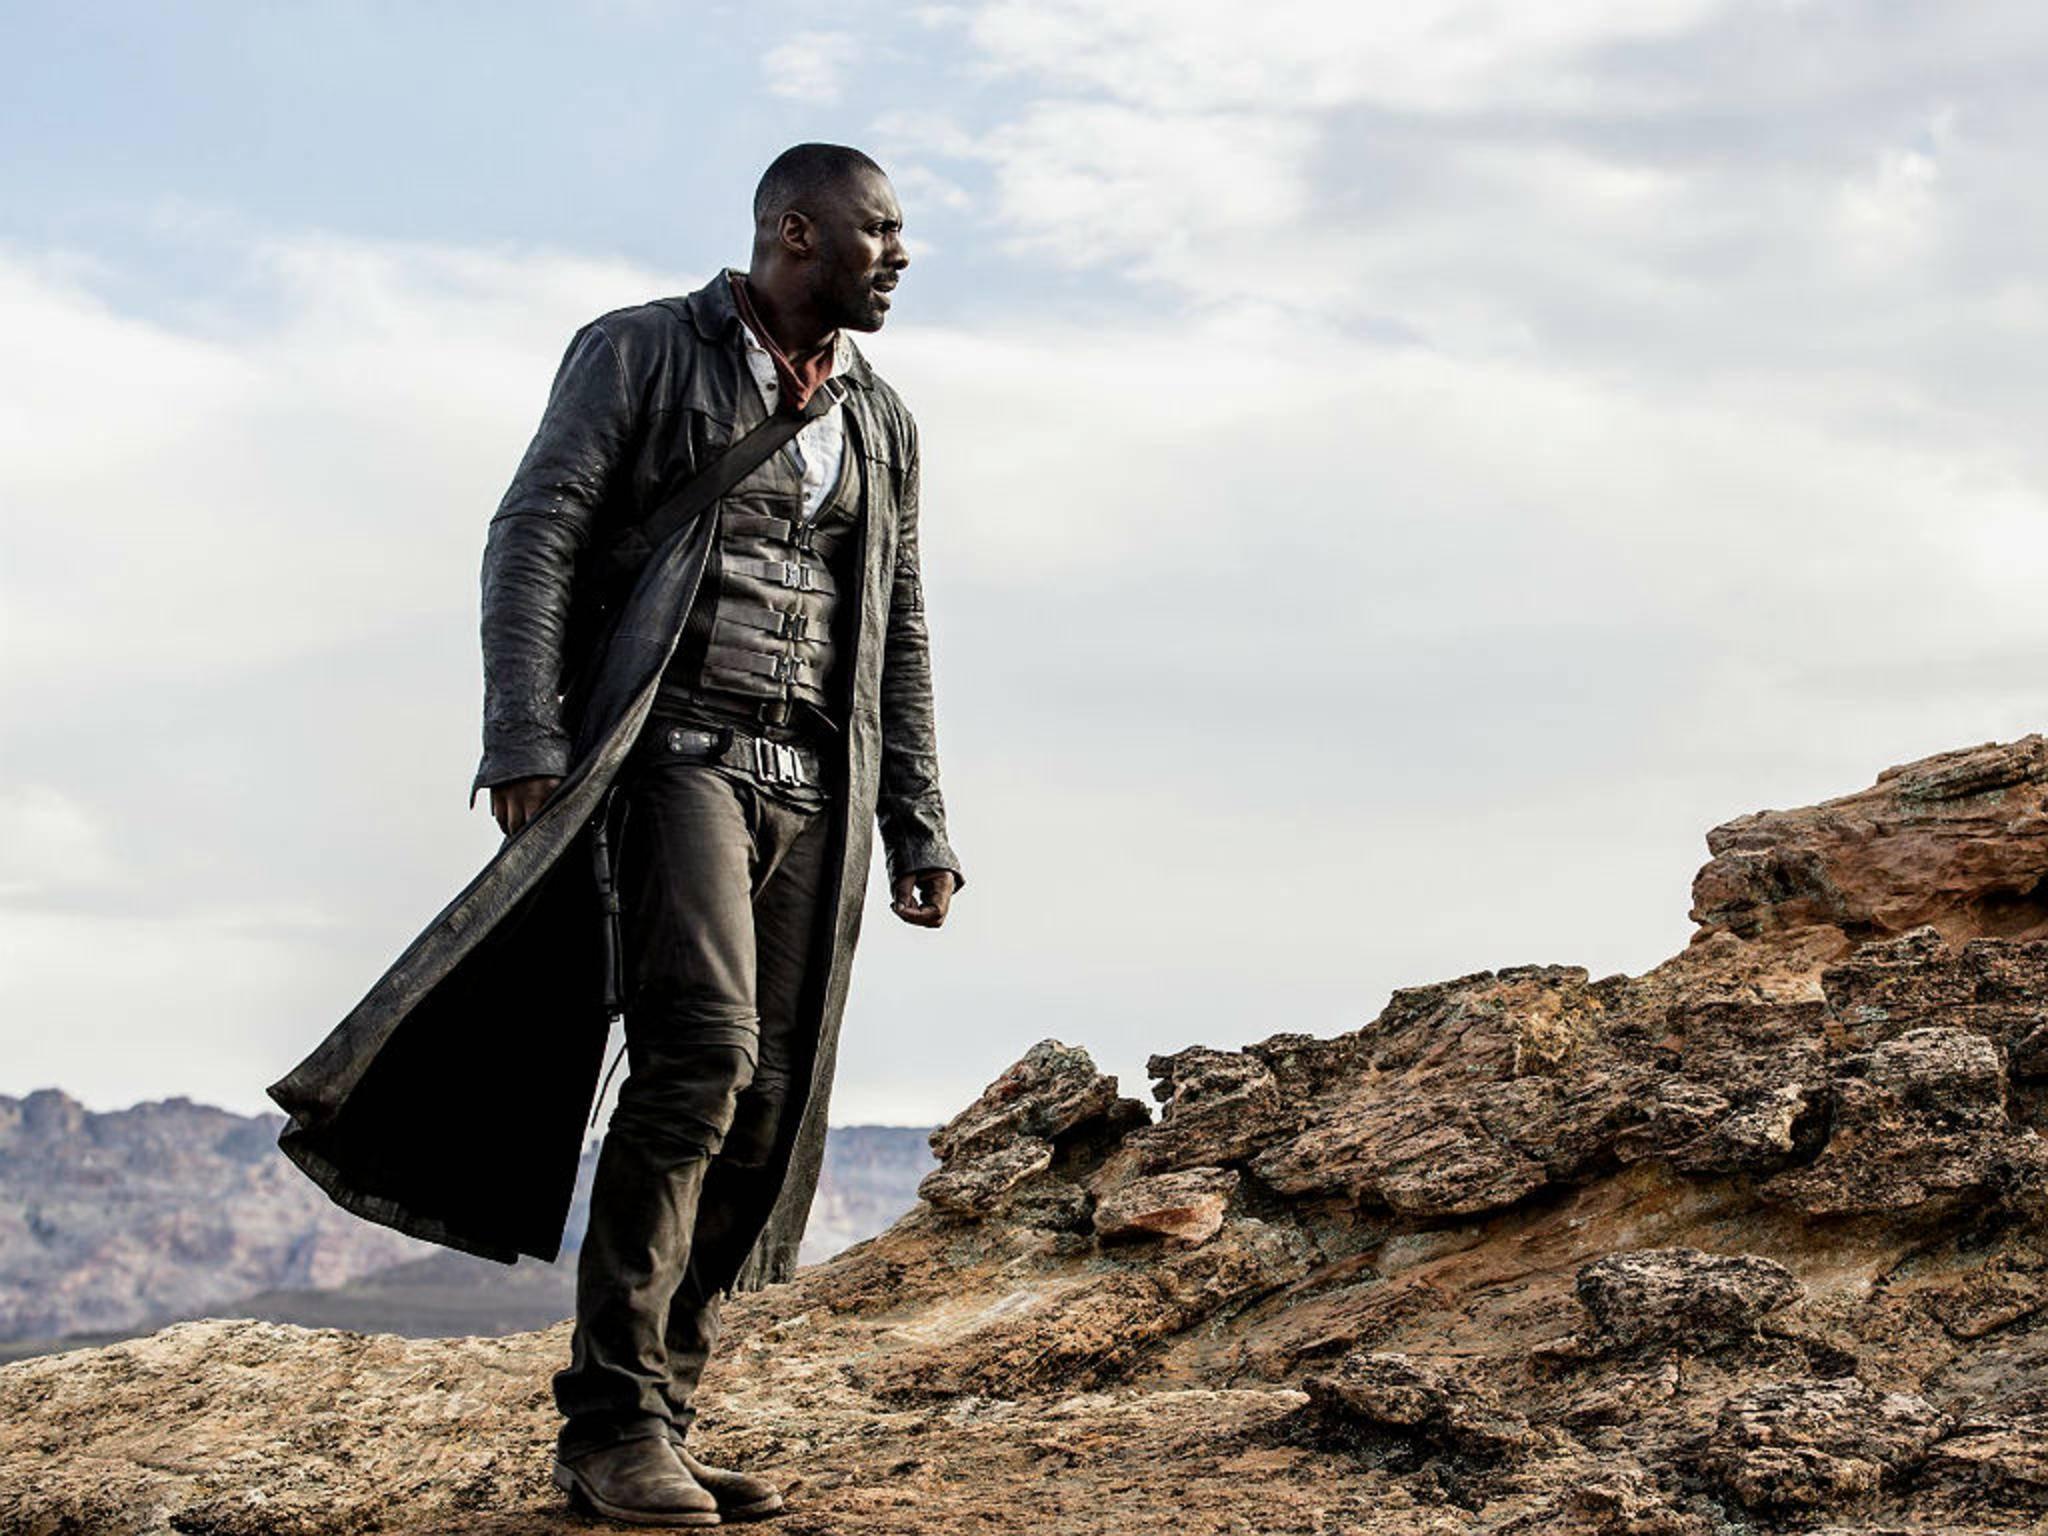 So sieht offenbar Idris Elba als Roland Deschain aus.